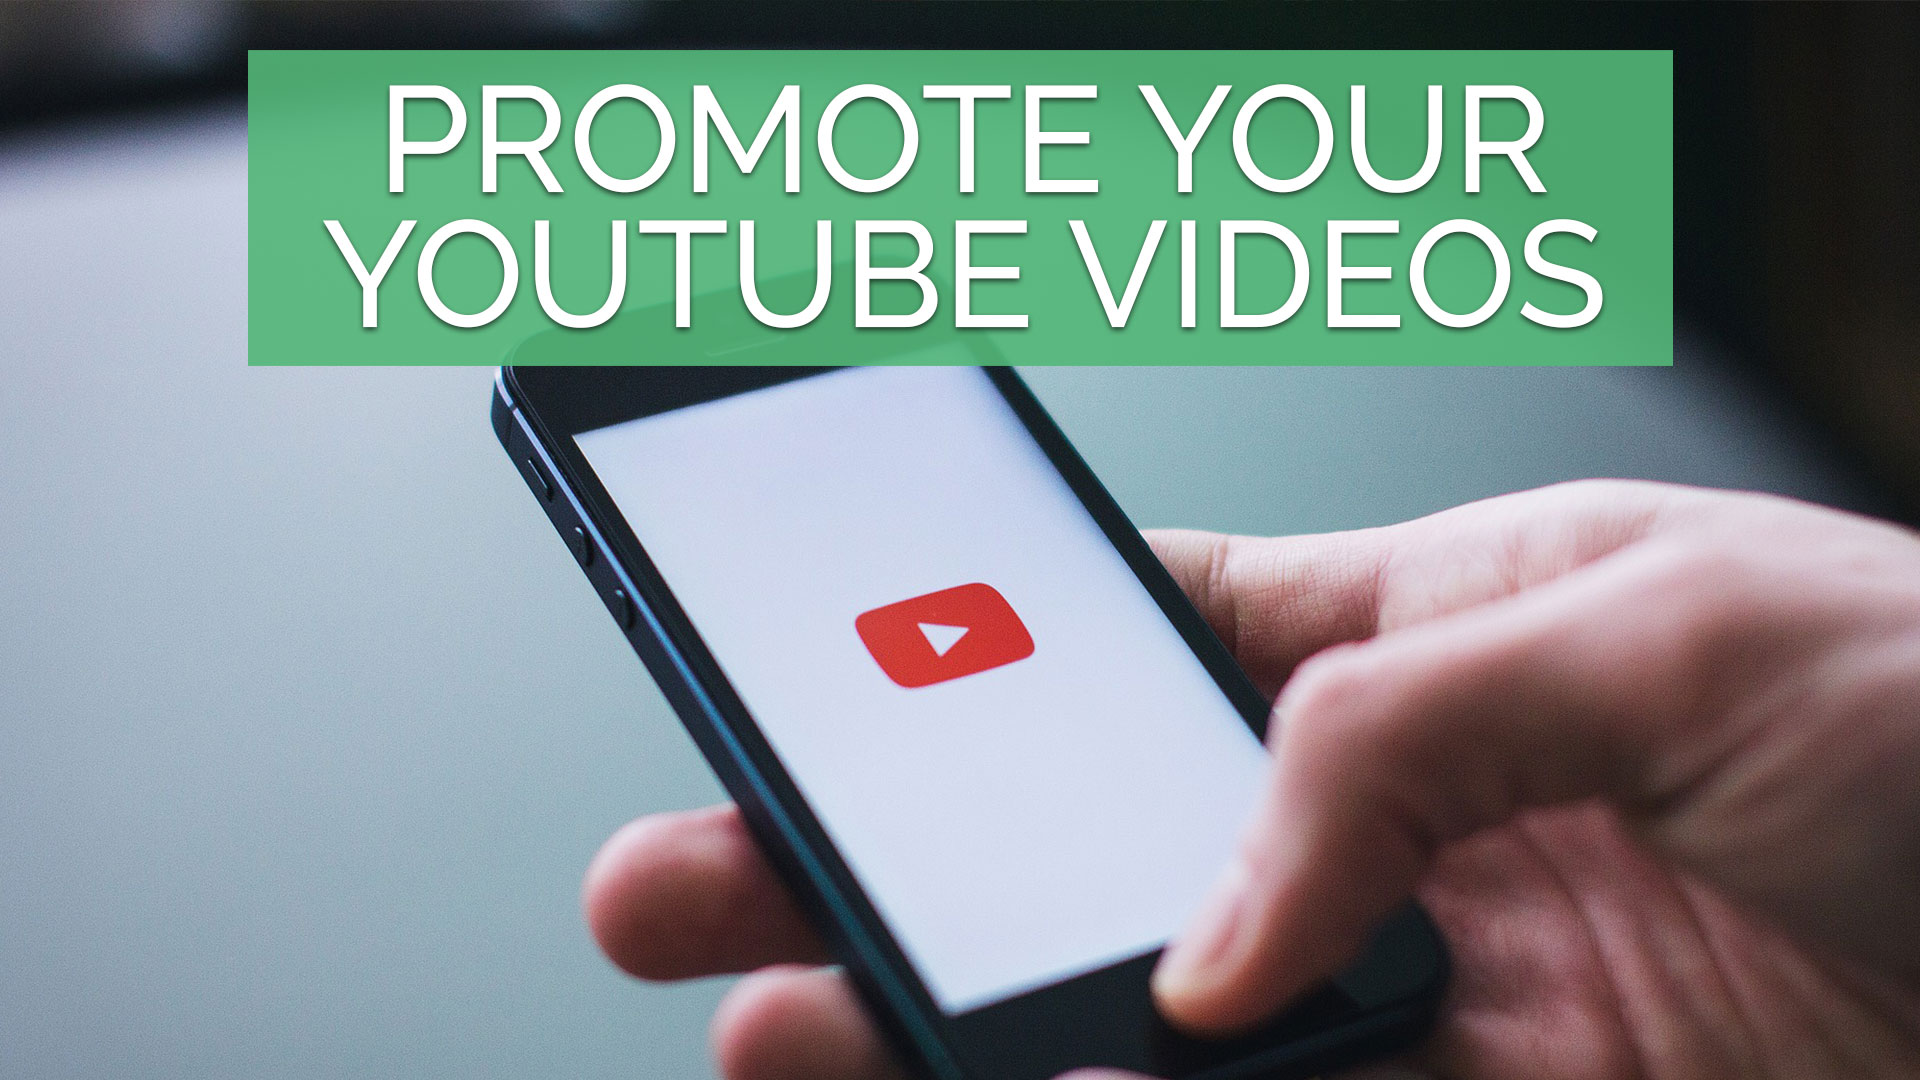 PROMOTE-YOUR-YOUTUBE-VIDEOS_THUMBNAIL_WEB